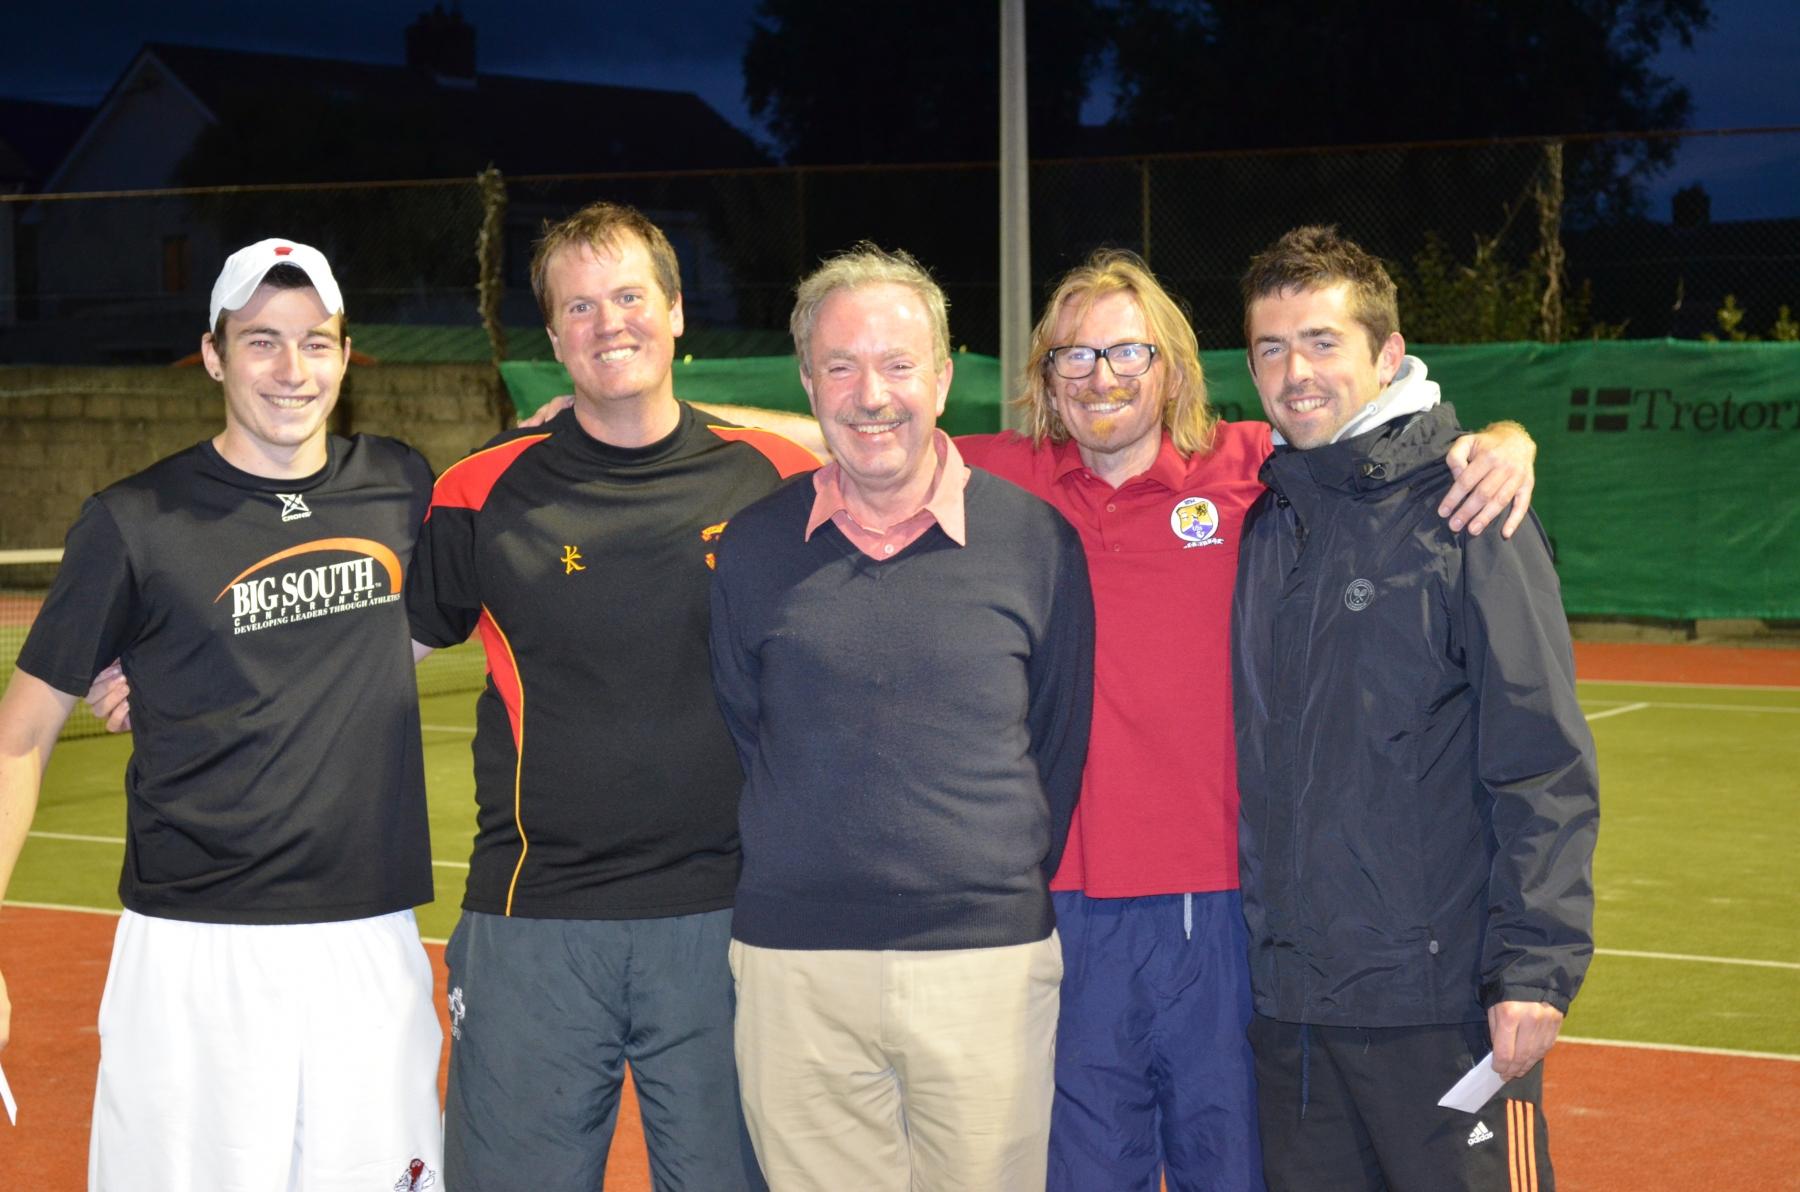 Mens-Doubles-Class-2-3-Finalists-Stephen-Martin-Kevin-Conroy-v-Dave-Barry-Nicholas-Fahey